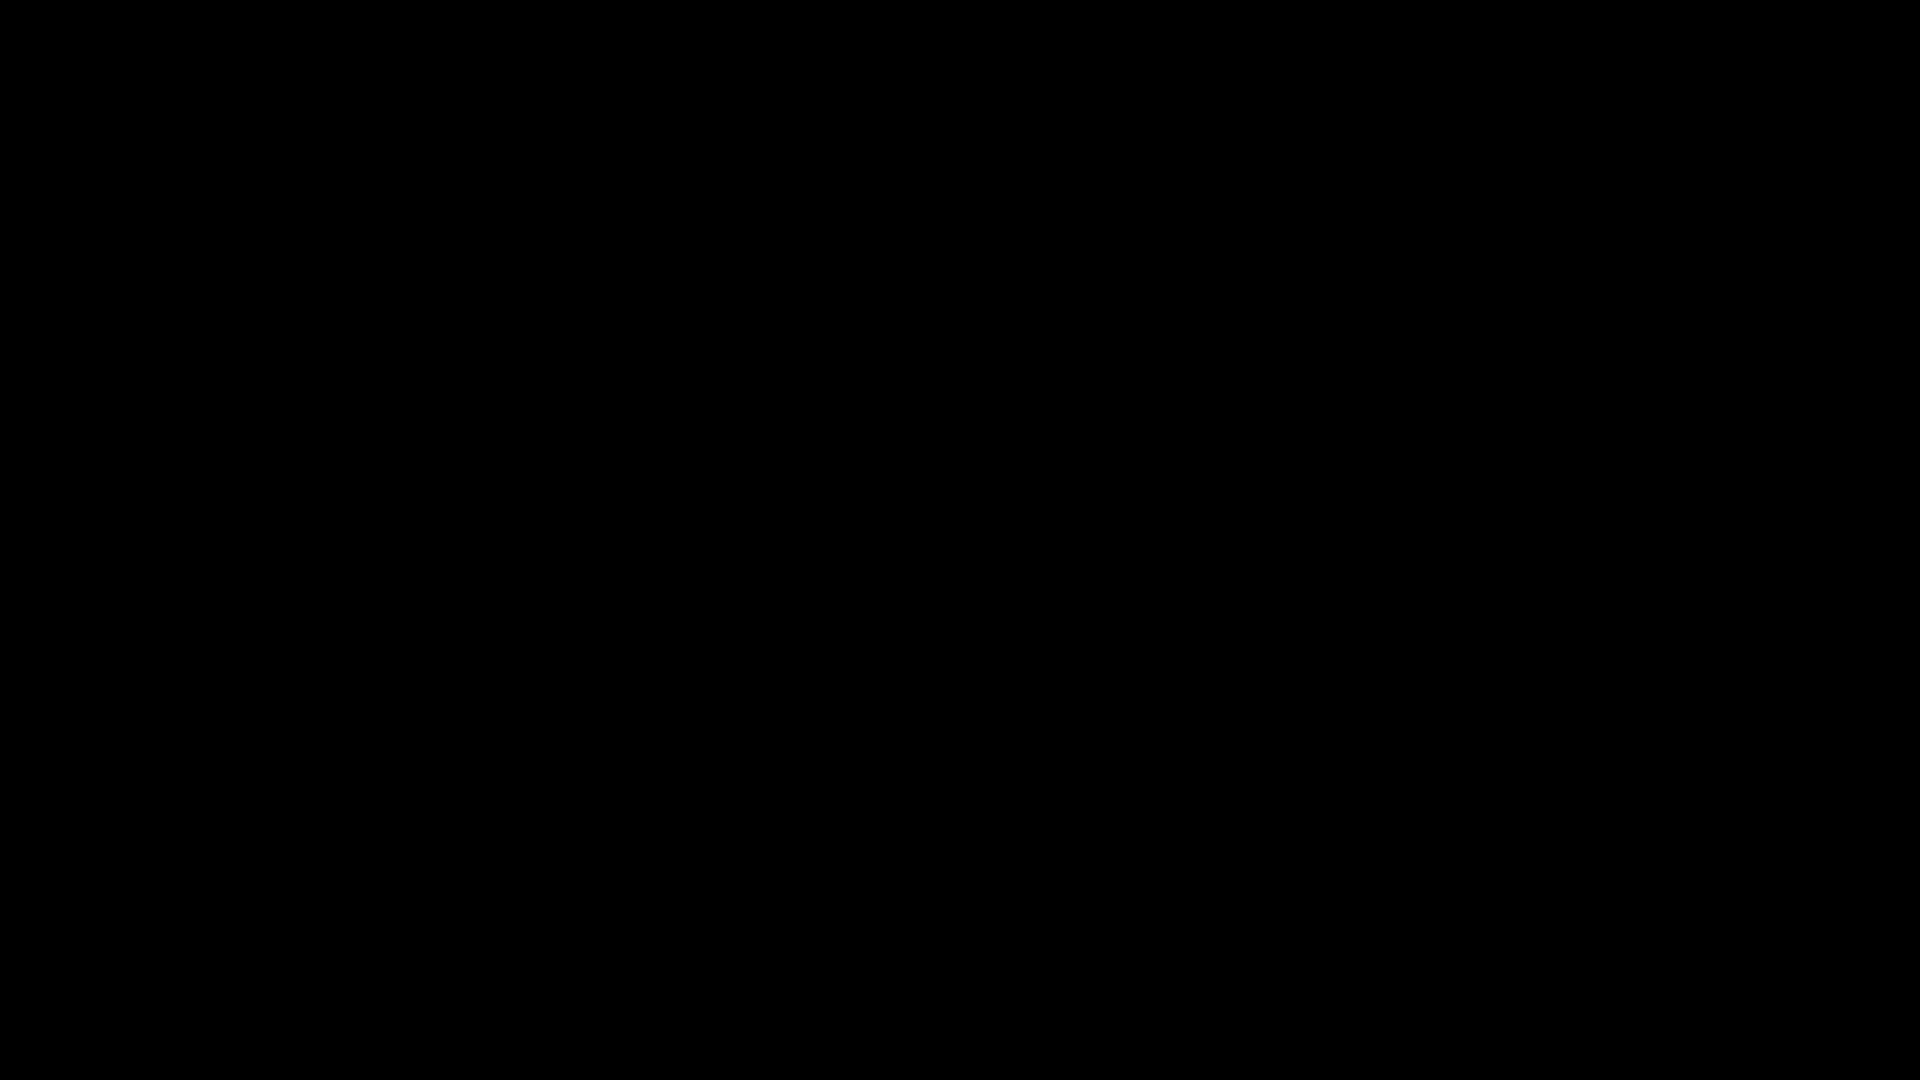 3d, 3dmax, adobe, aftereffects, cg, cgi, cinema, cinema4d, film, filming, filmmaker, filmmaking, fx, houdini, maya, movie, nuke, postproduction, render, vfx, JACKIE - VFX Breakdown GIFs